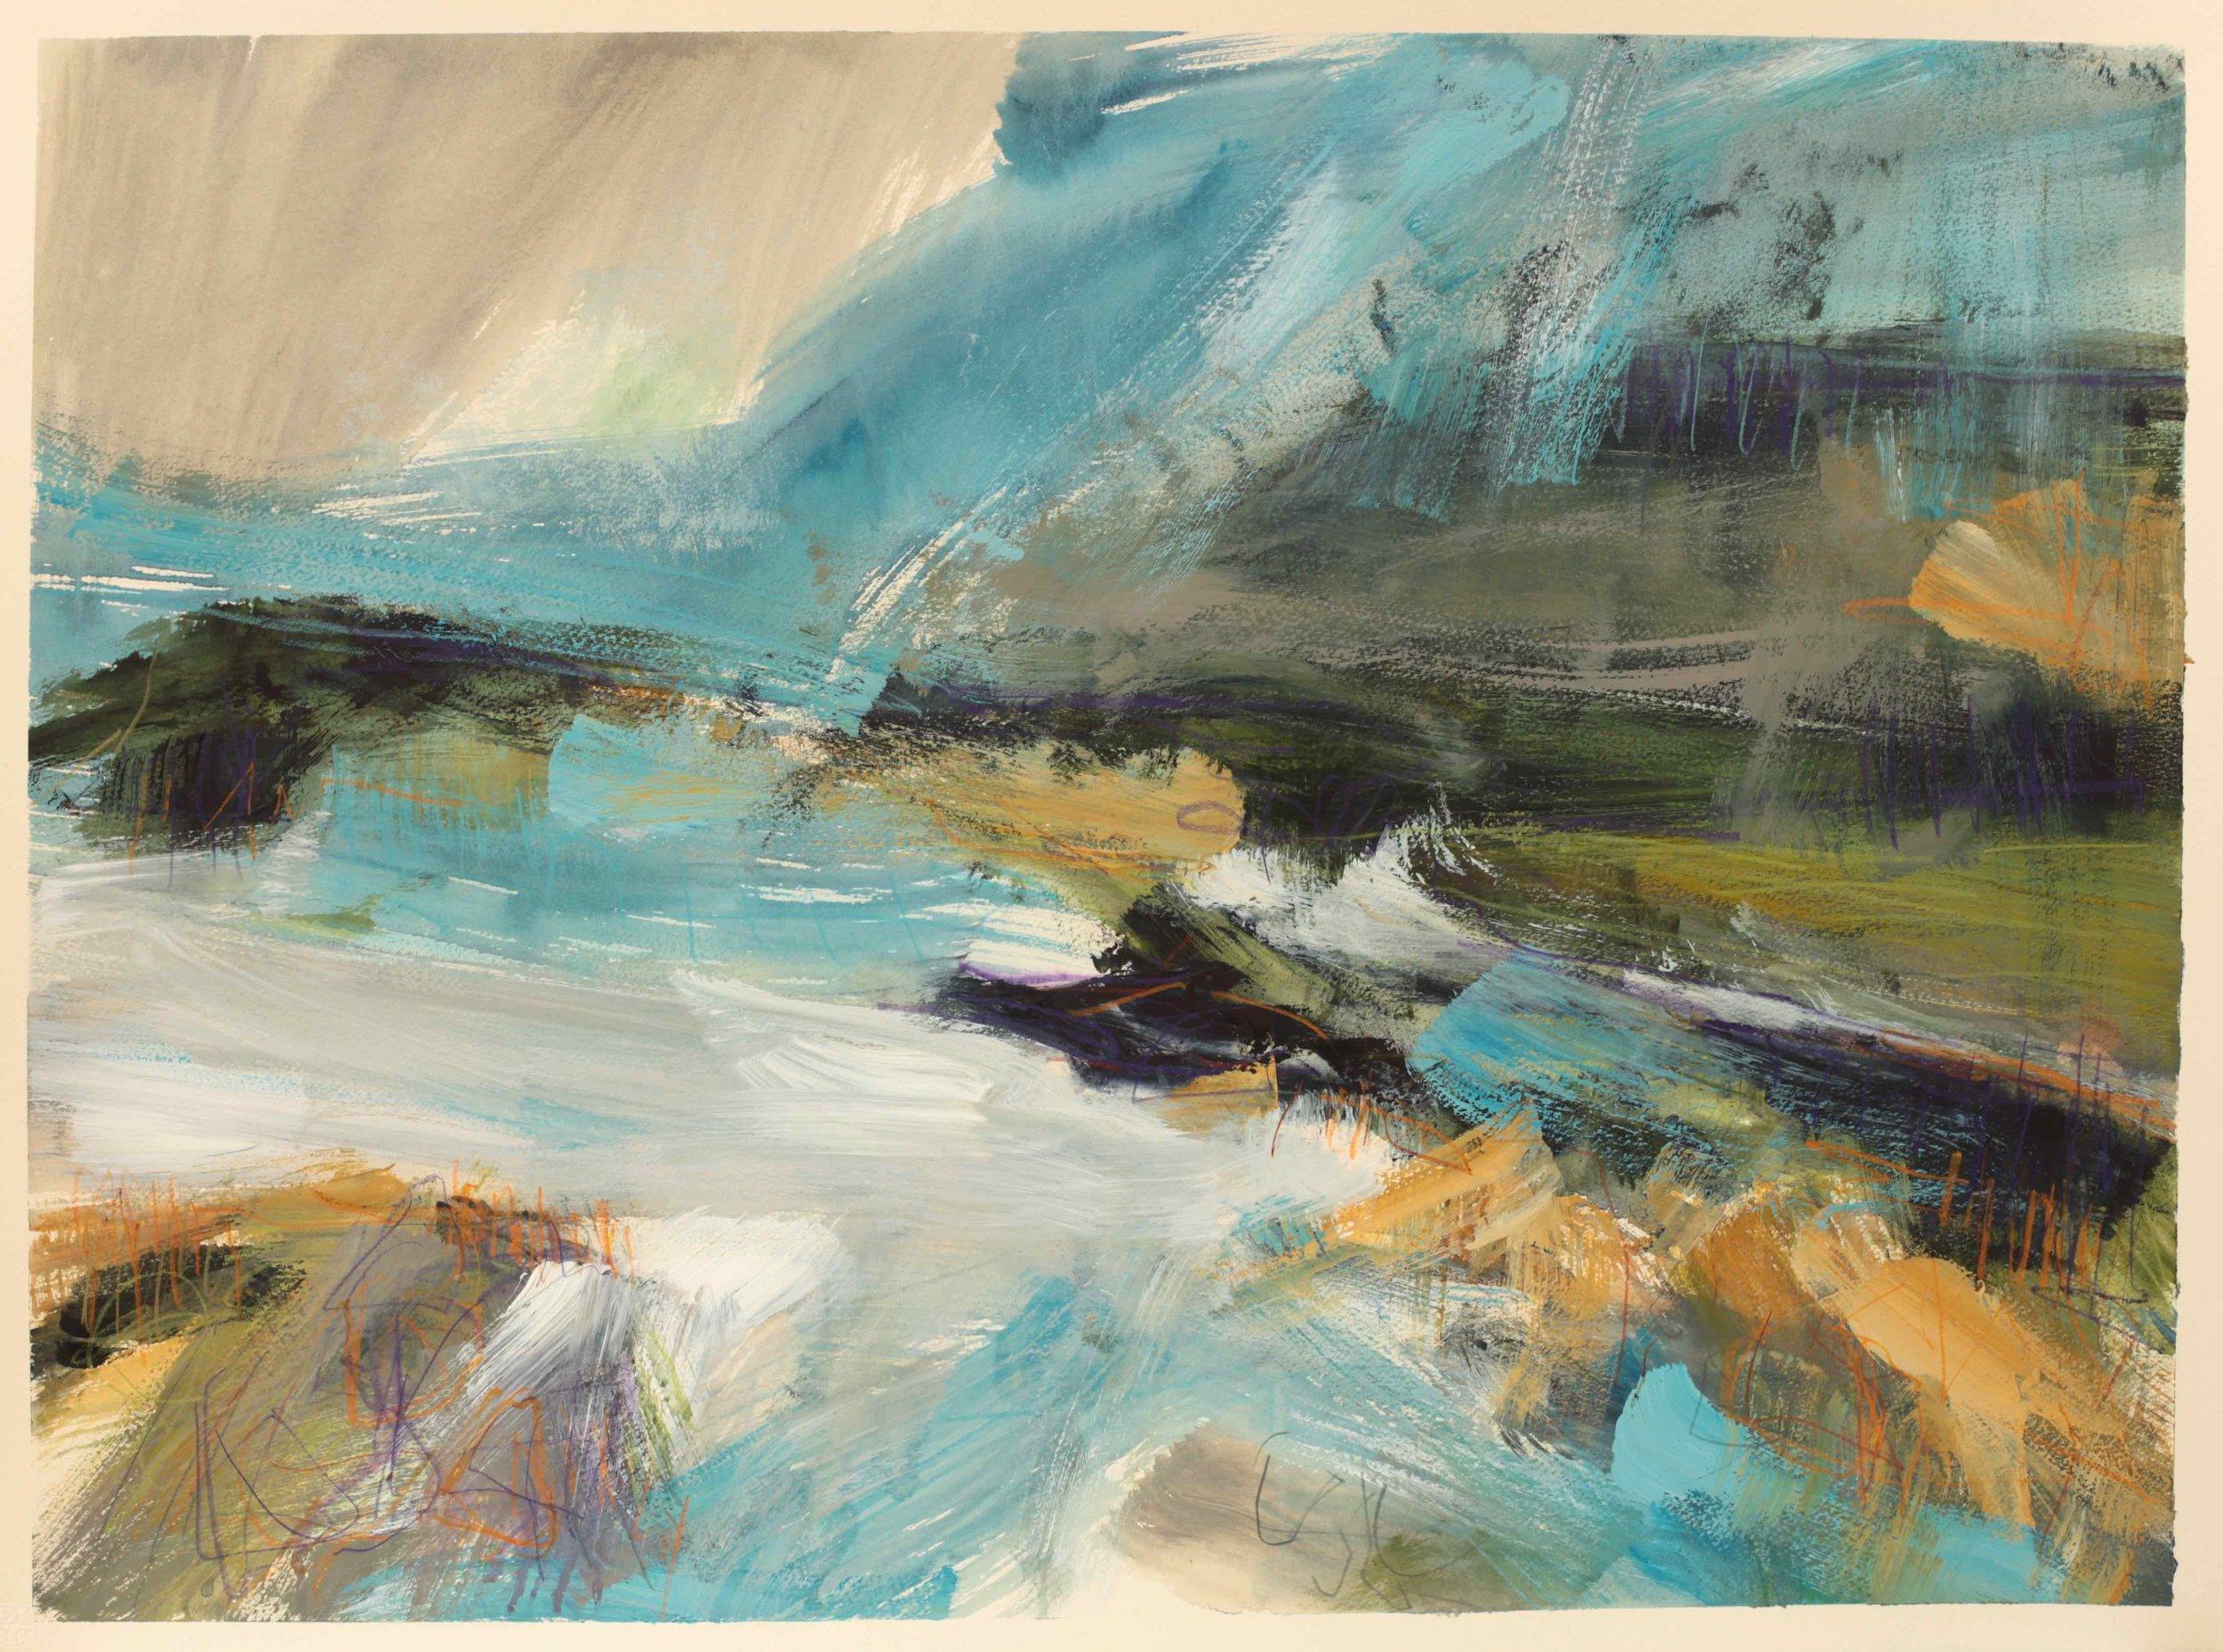 Coastal inlet, watercolour, 60 x 84cm